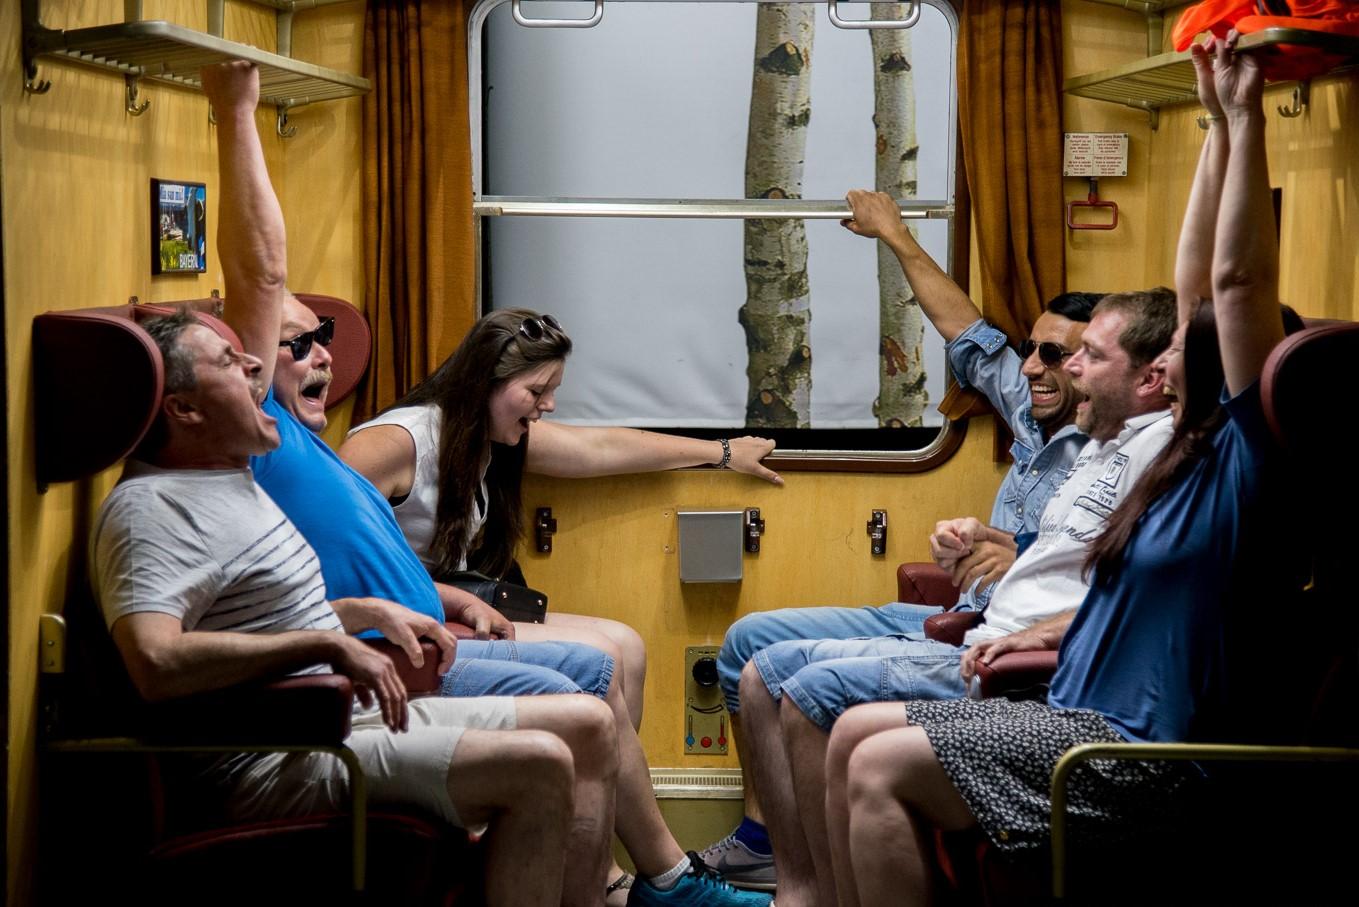 Bavaria Filmstudio - 6 Personen sitzen im Zug Studio